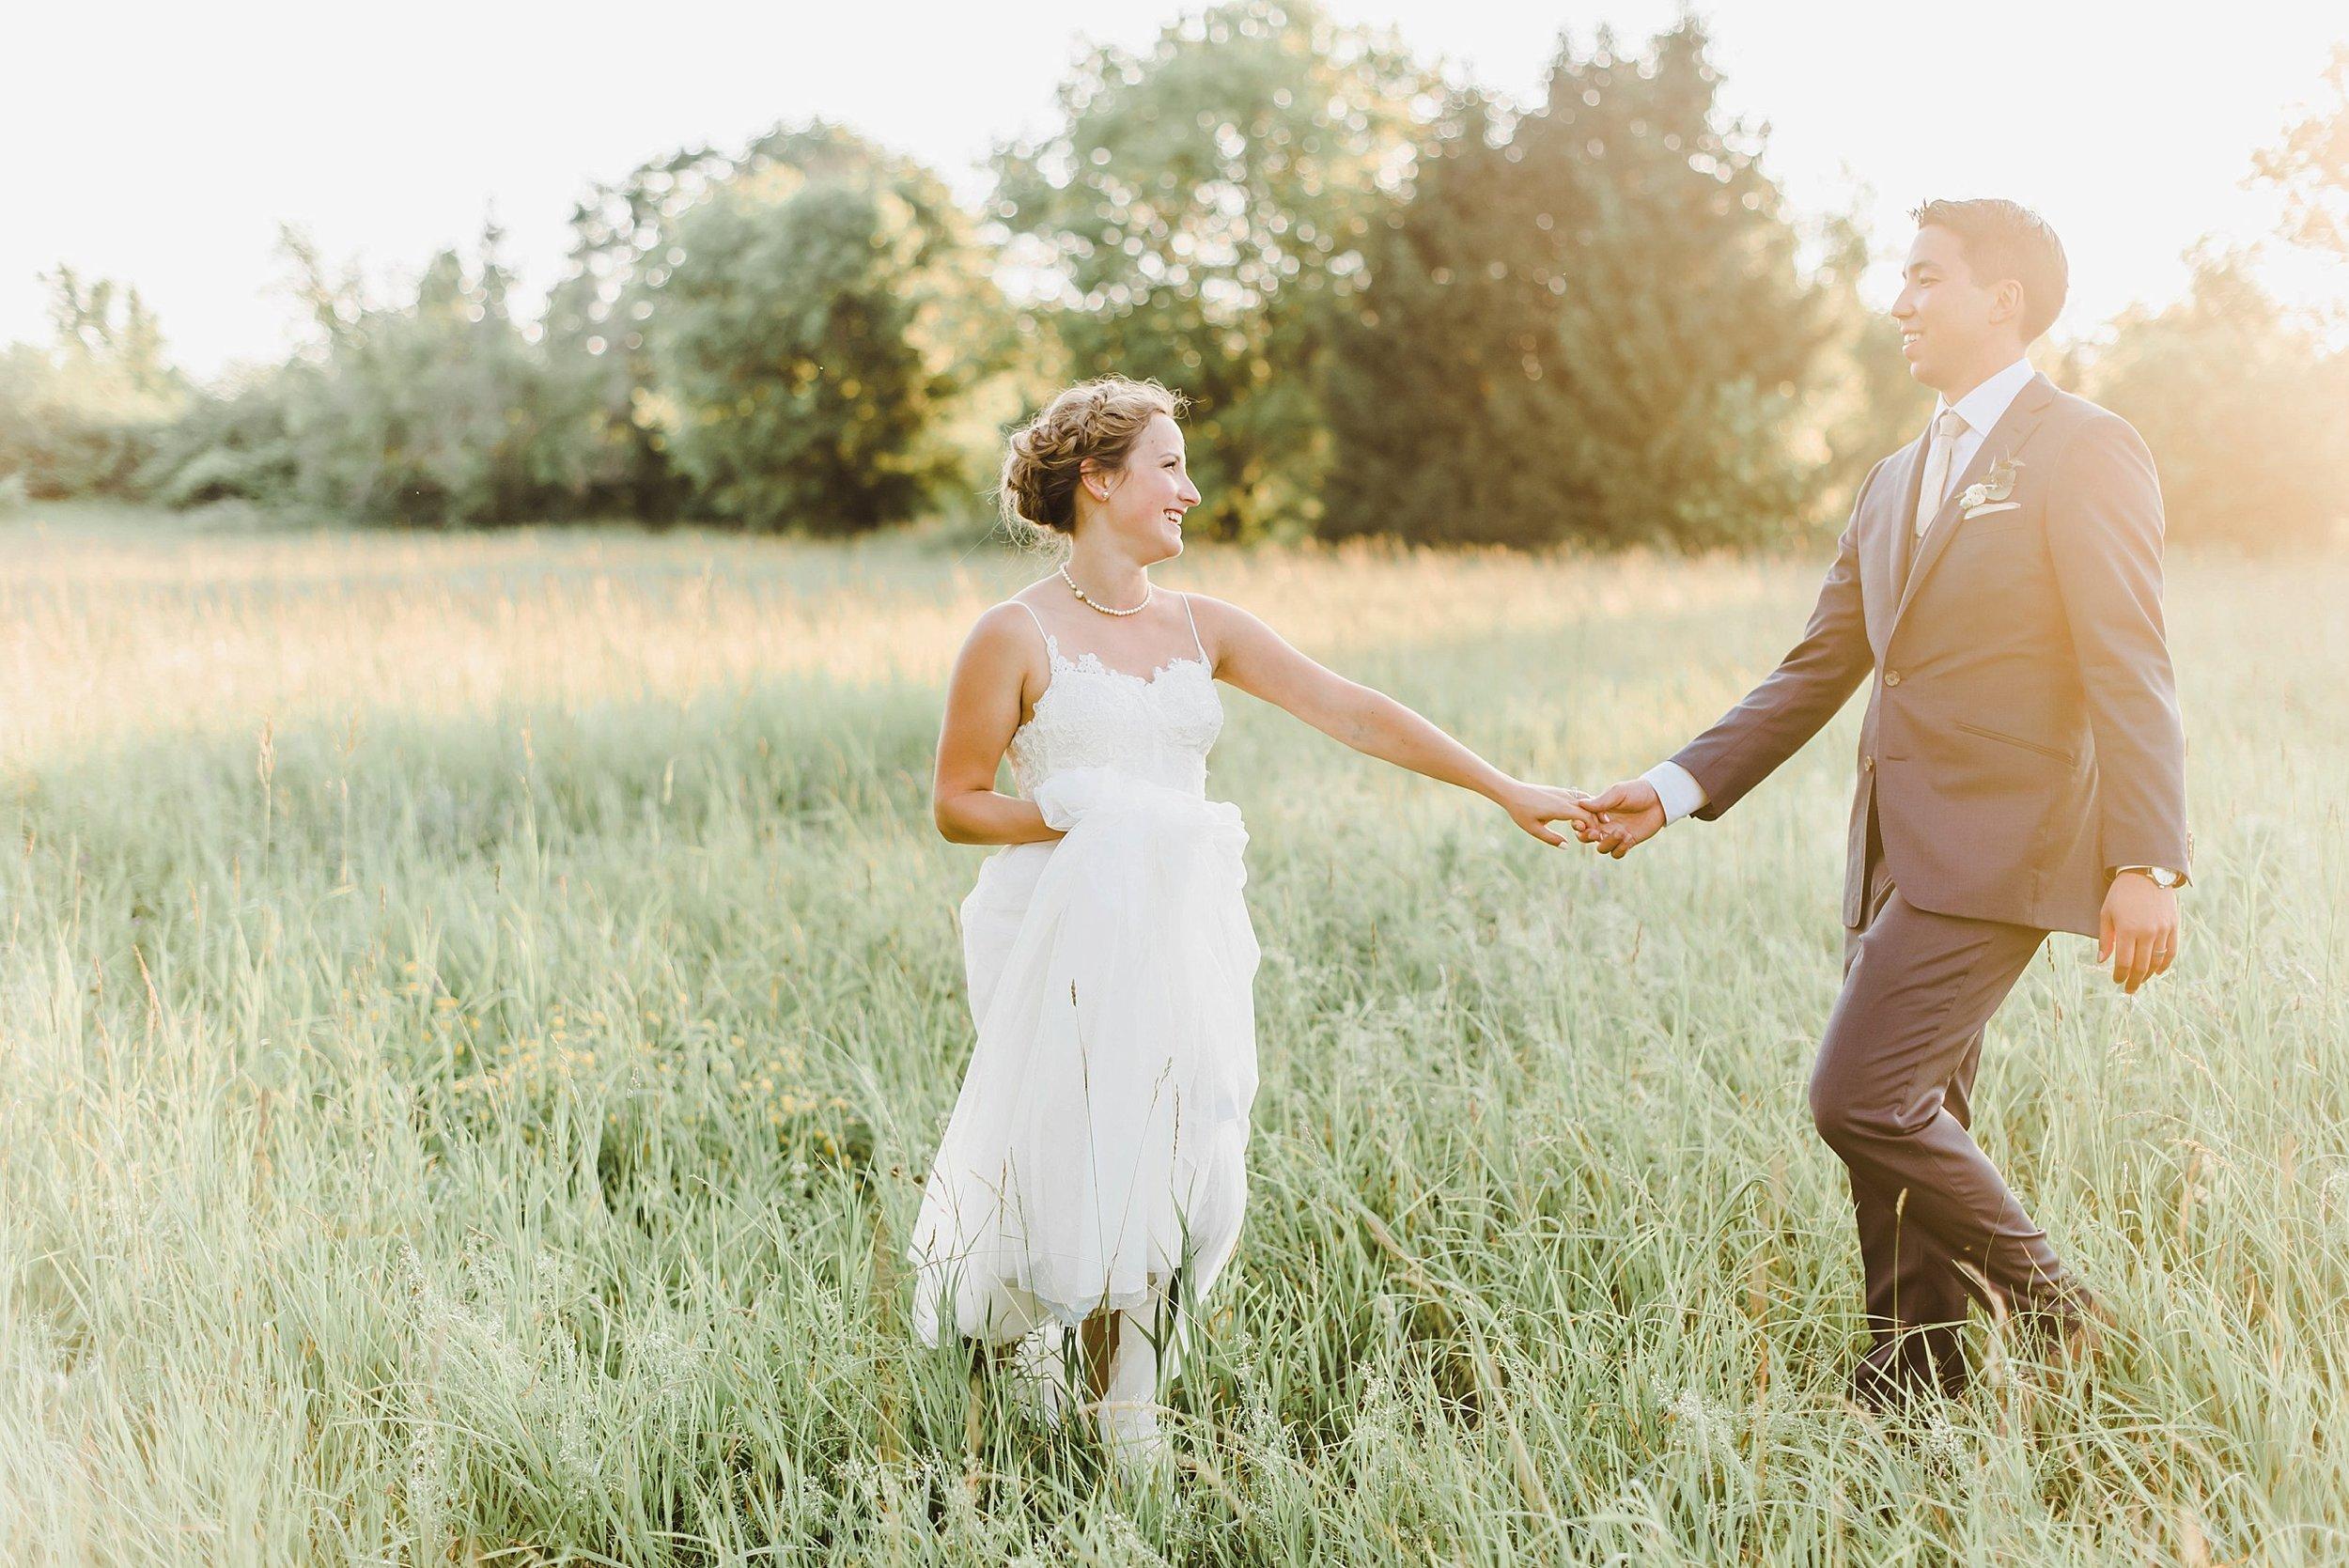 light airy indie fine art ottawa wedding photographer | Ali and Batoul Photography_0904.jpg